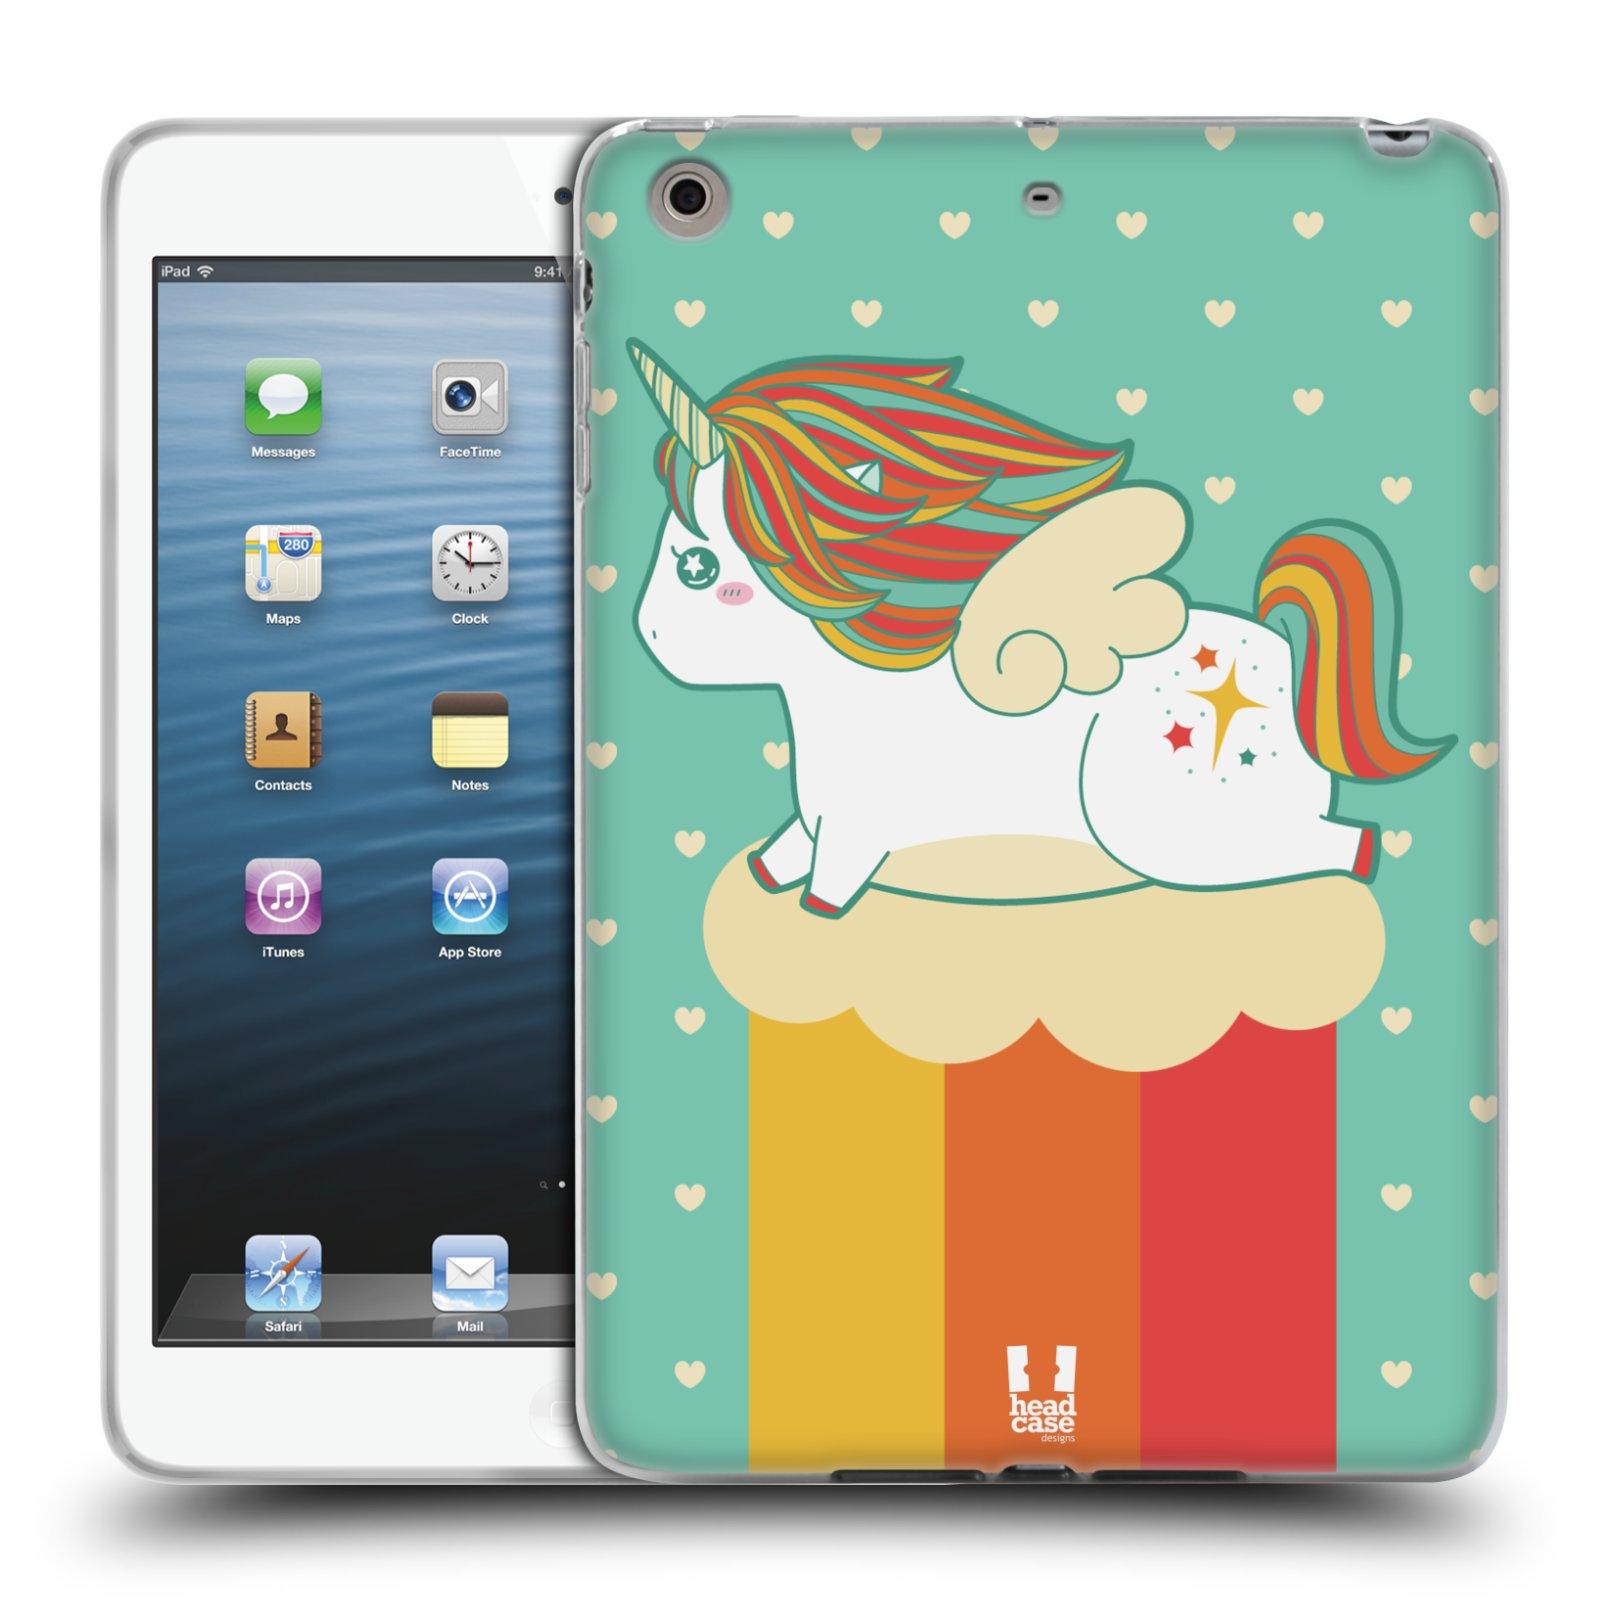 Squishy Ipad Cases : HEAD CASE DESIGNS UNICORN CHUBBY SOFT GEL CASE FOR APPLE iPAD MINI 1 2 3 eBay